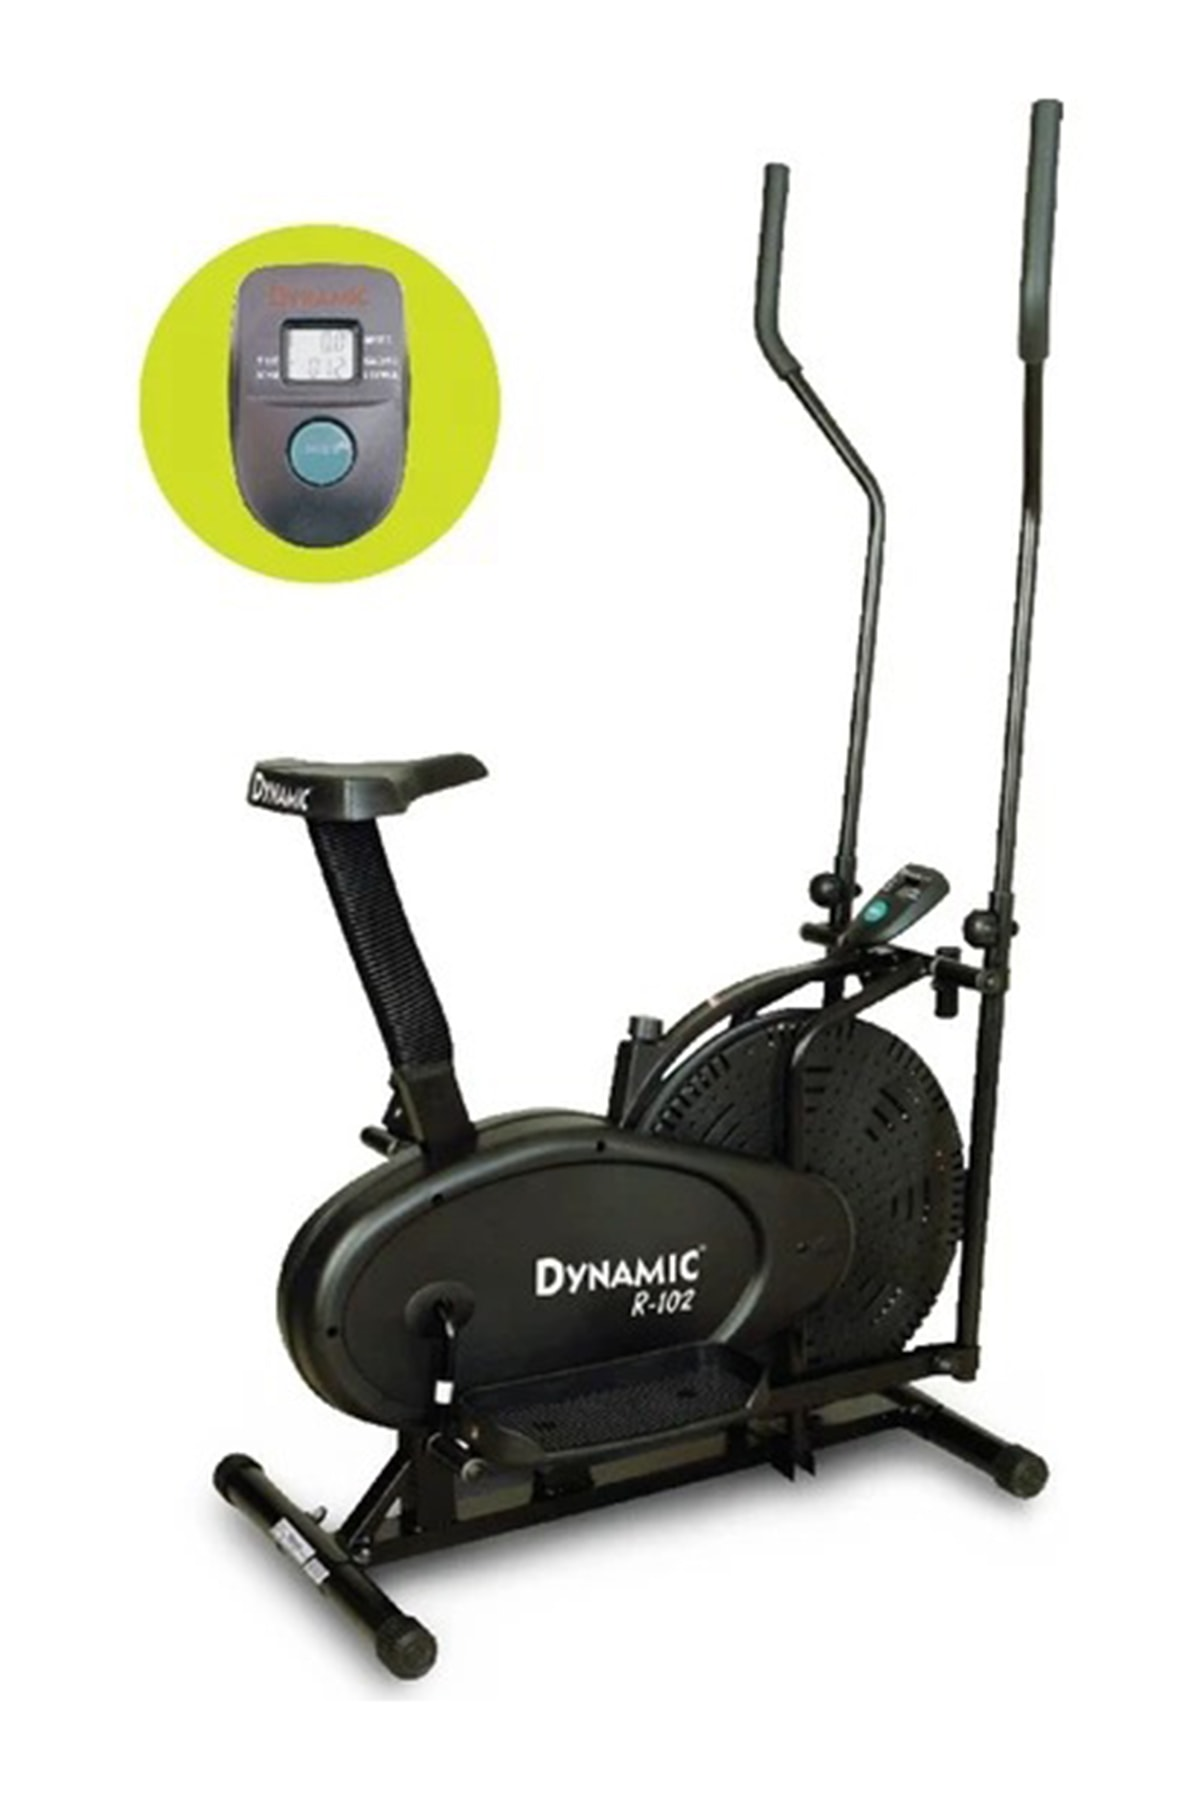 Dynamic R102N Eliptik Bisiklet Orbitroller Orbitrack 1